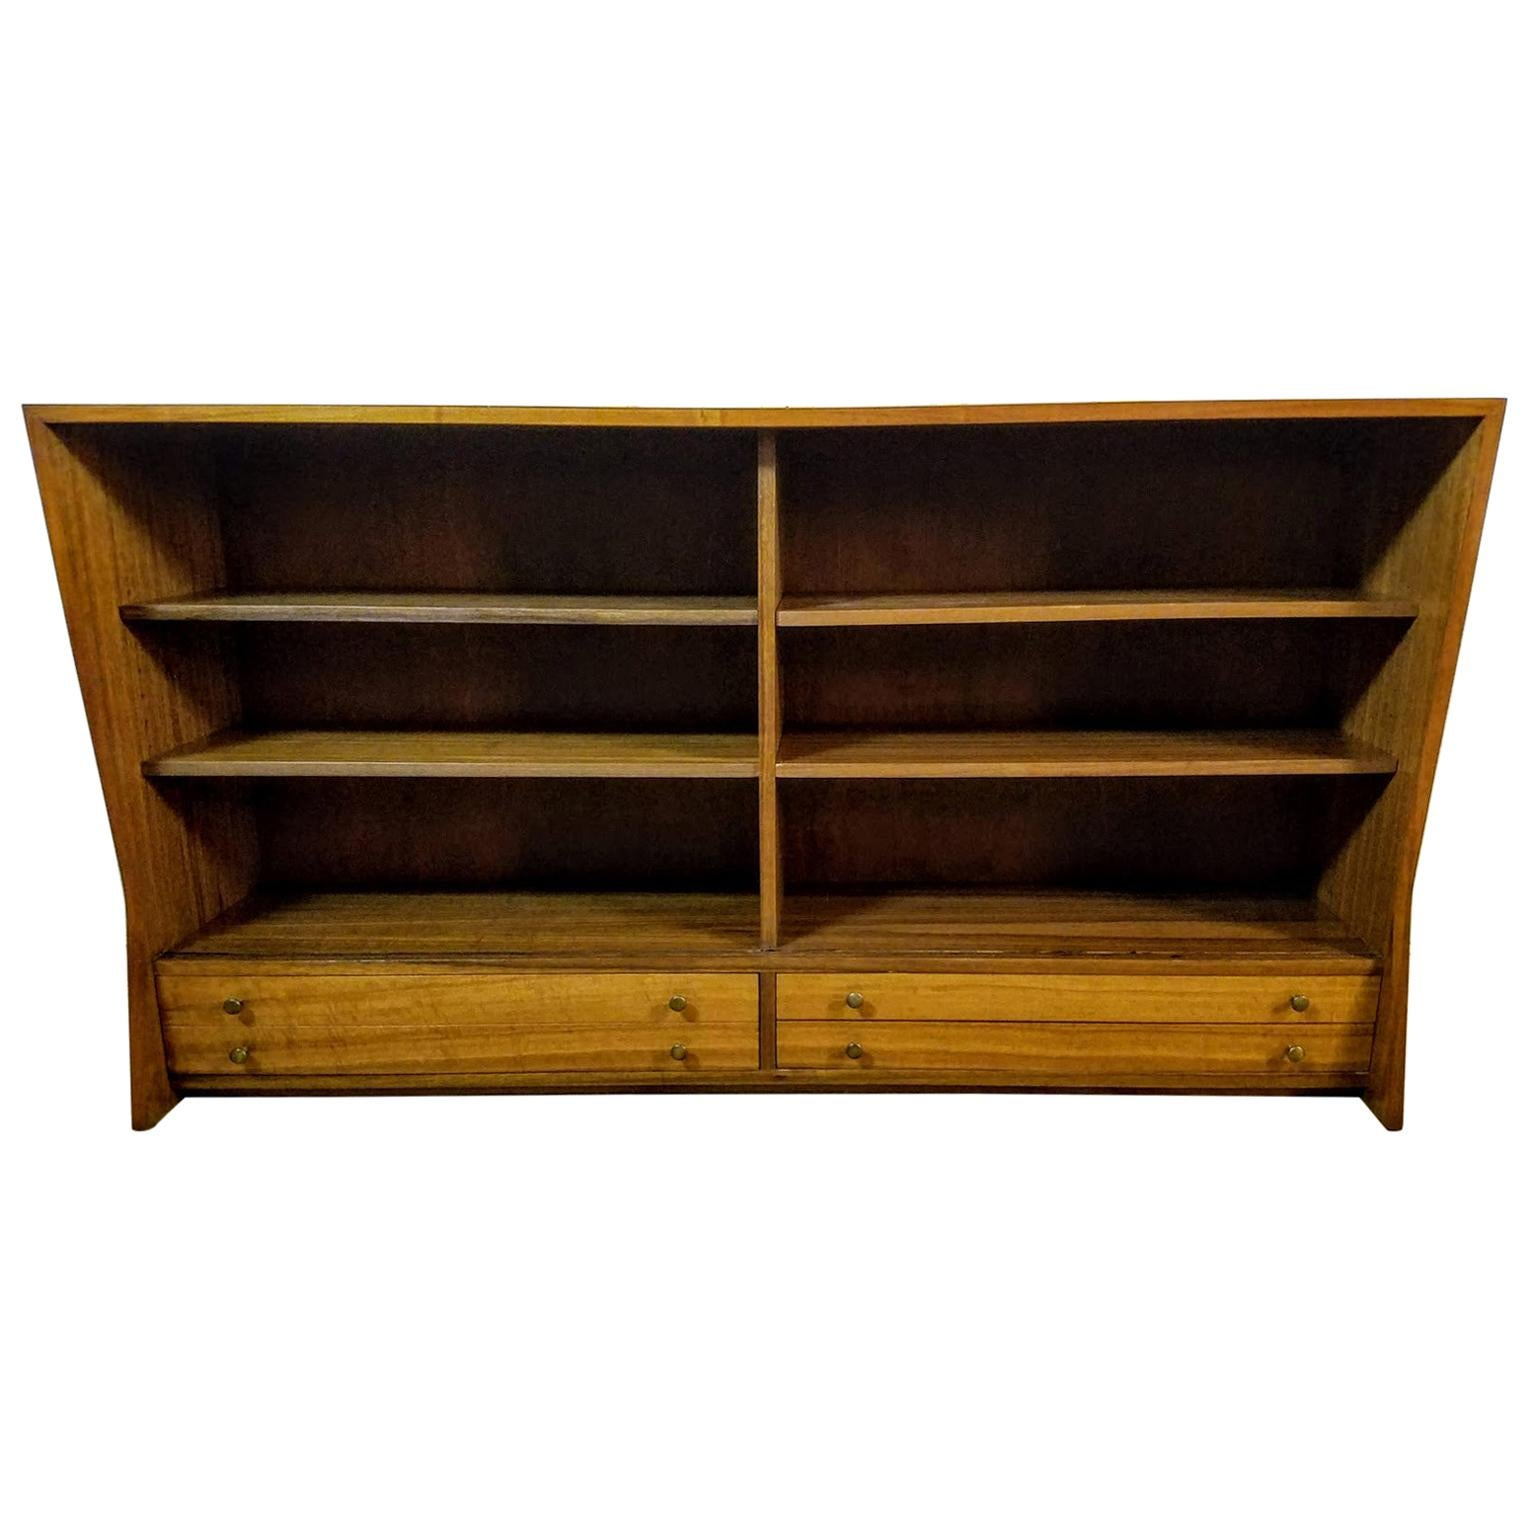 George Nakashima Sideboard Upper Cabinet Model 277 Walnut Widdicomb Origins 1960